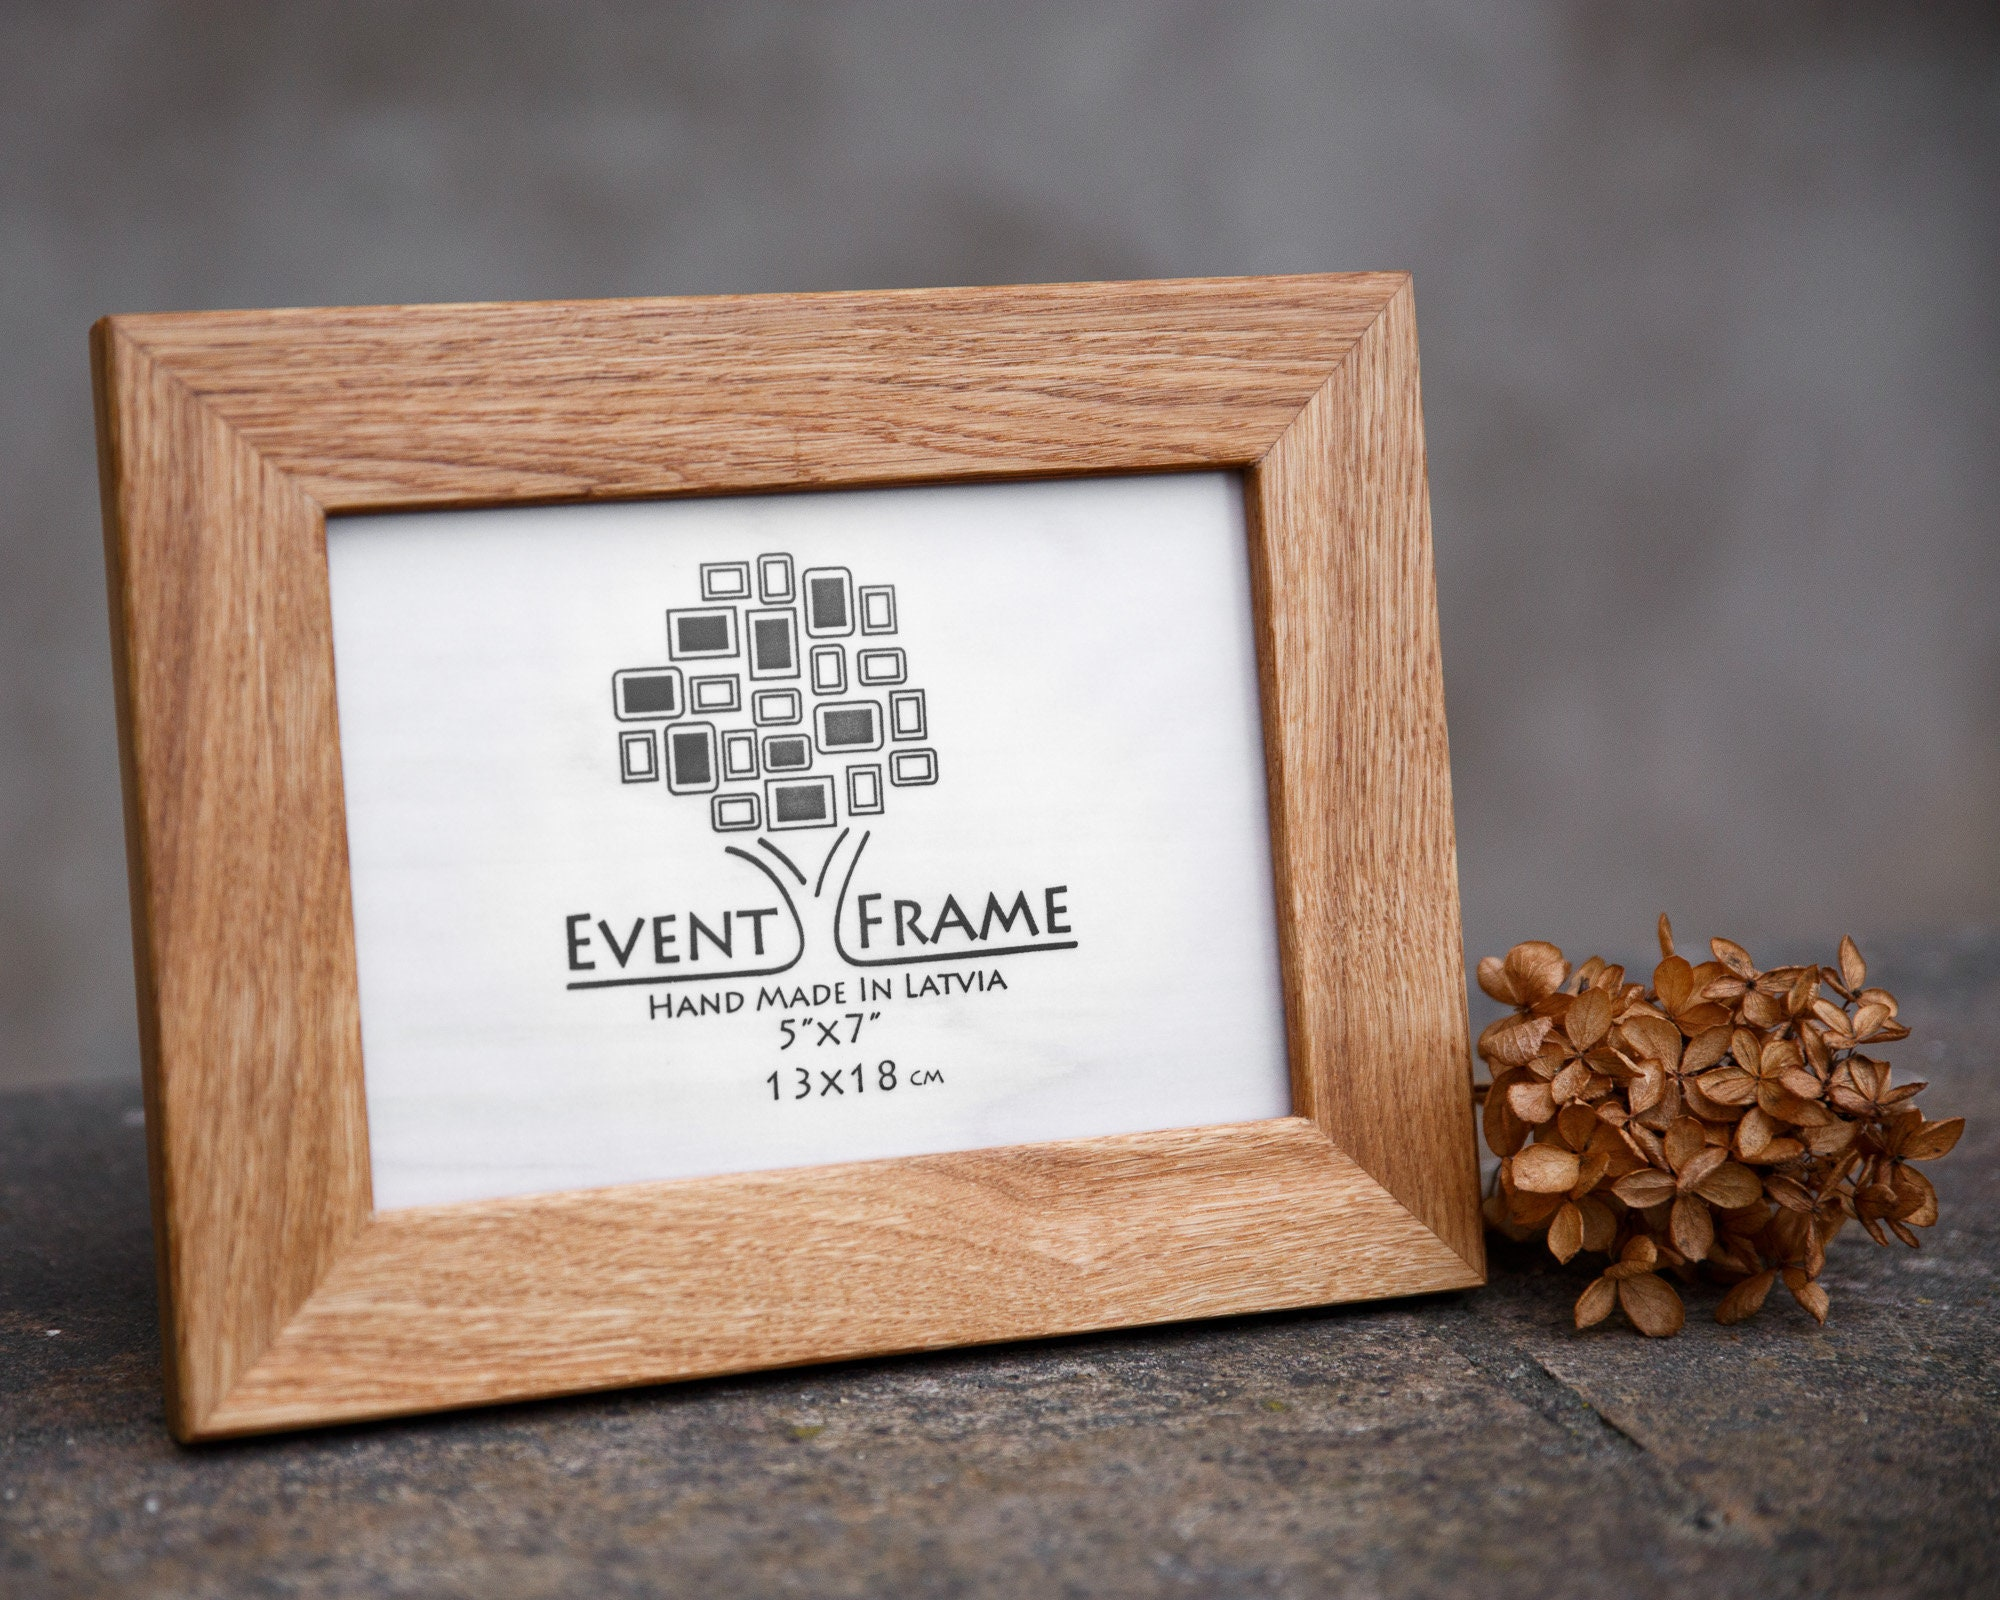 Eiche Bilderrahmen Holz Bilderrahmen Holzrahmen Gestell aus | Etsy